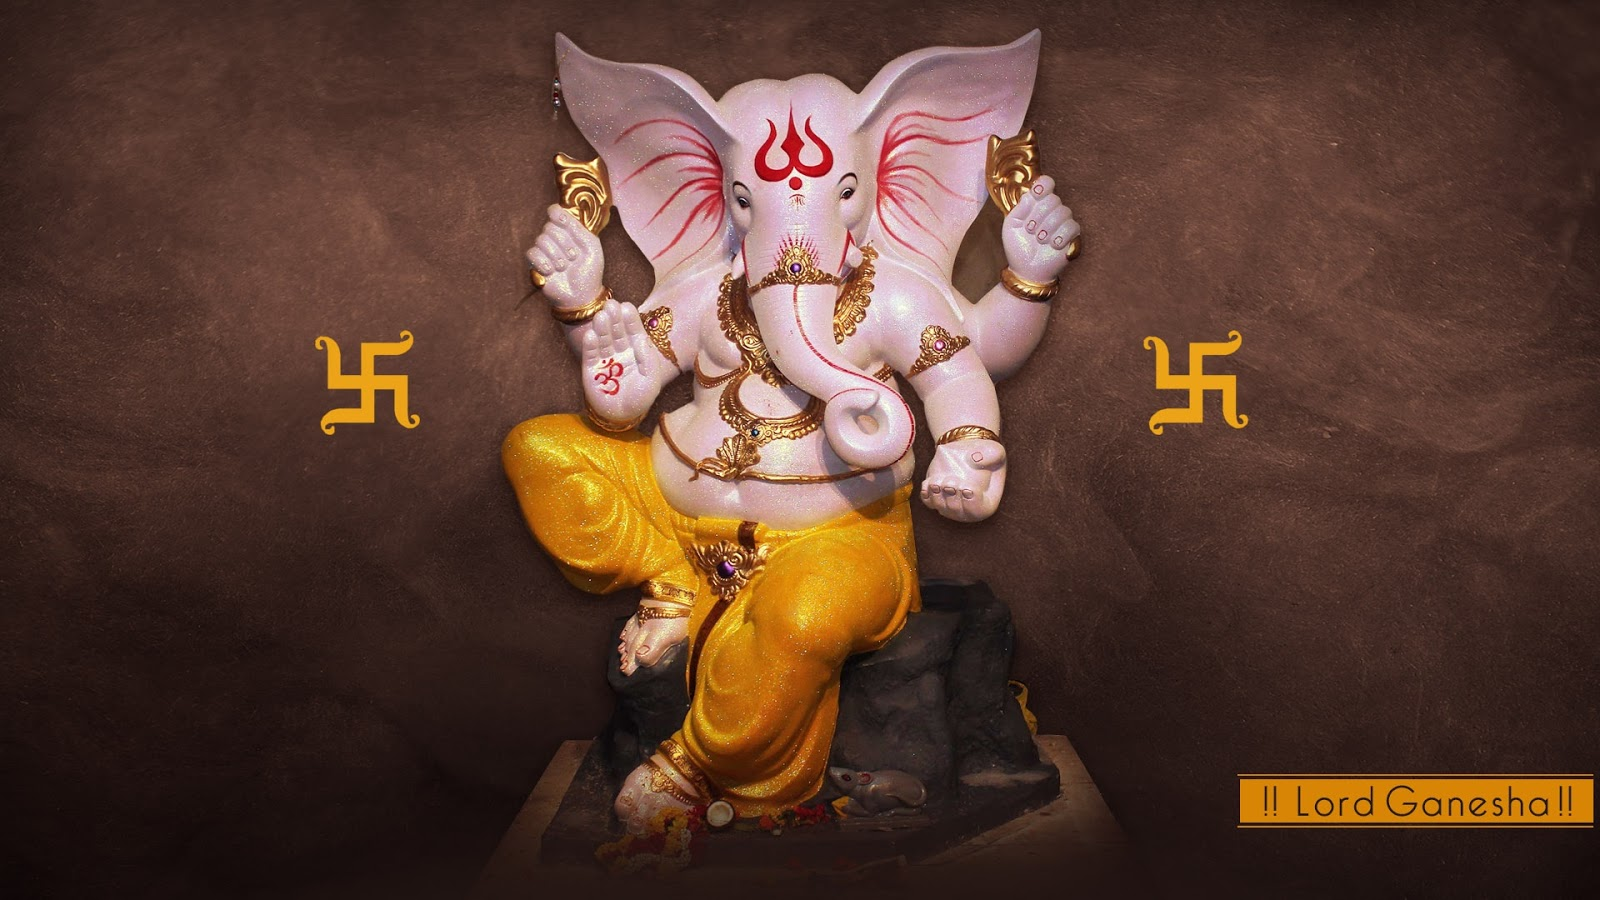 Ganesha Stone God Wallpaper